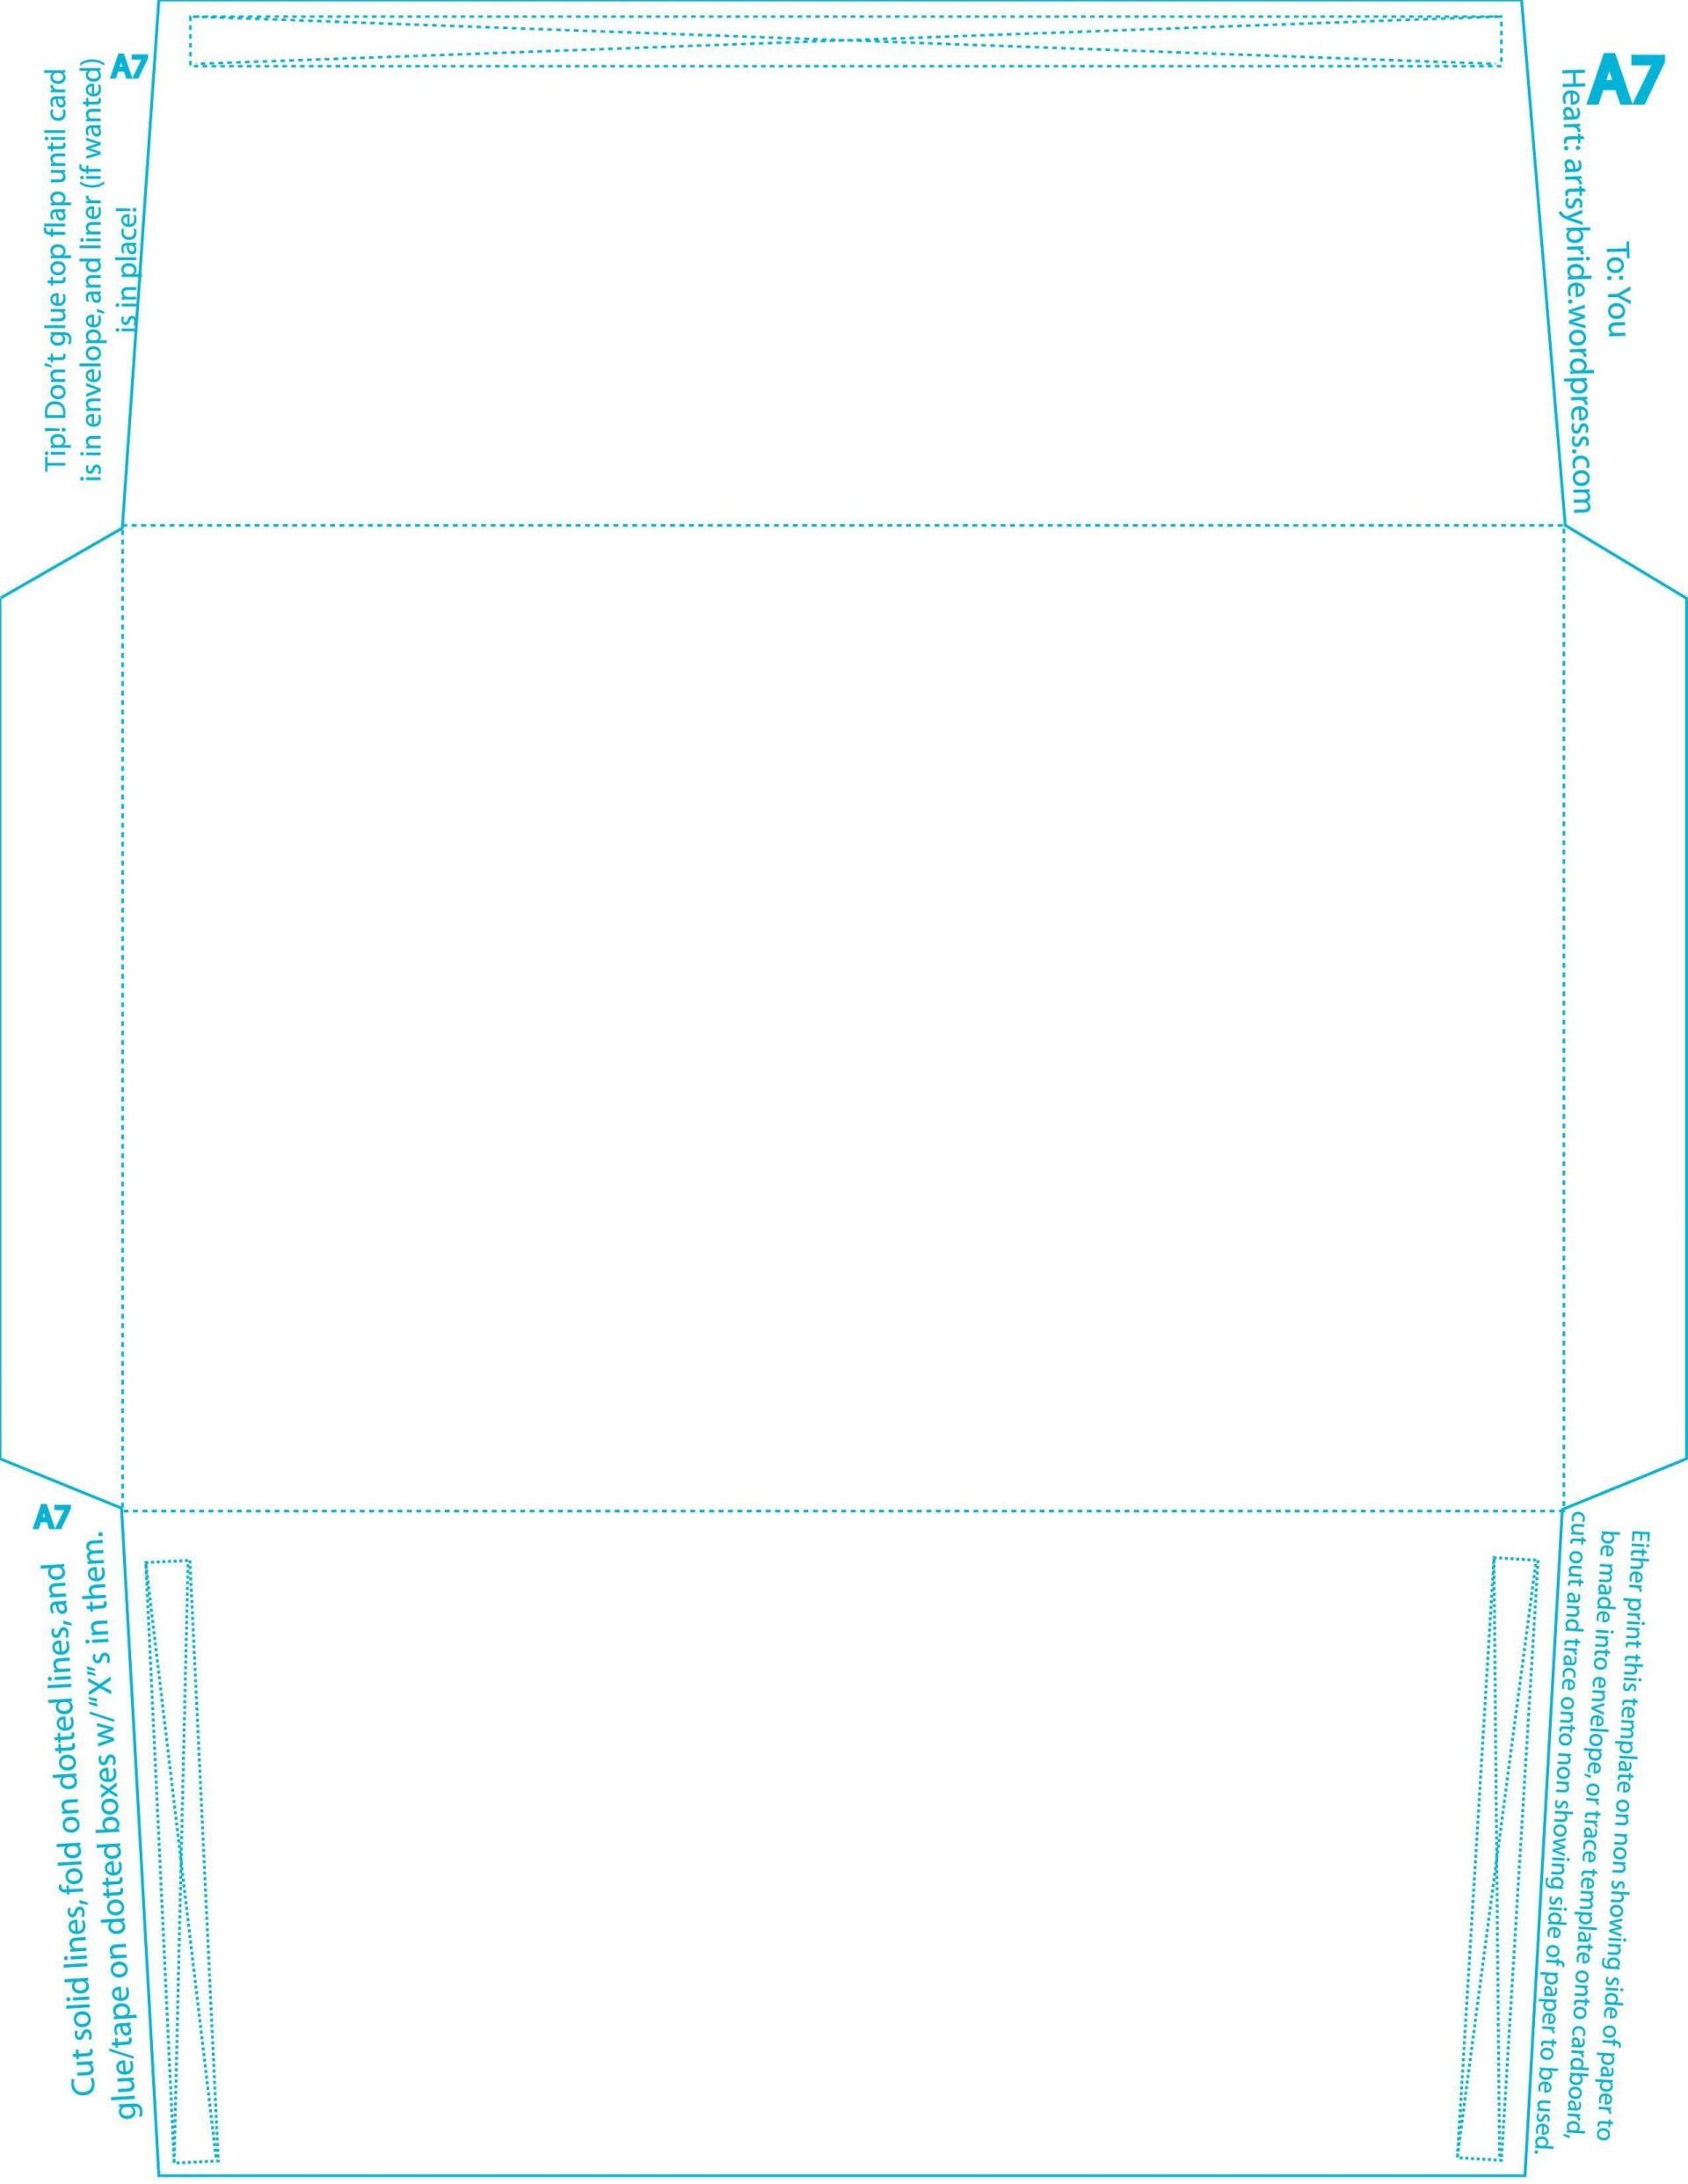 008 Wondrou A7 Envelope Liner Template High Def  Printable Illustrator Free1920